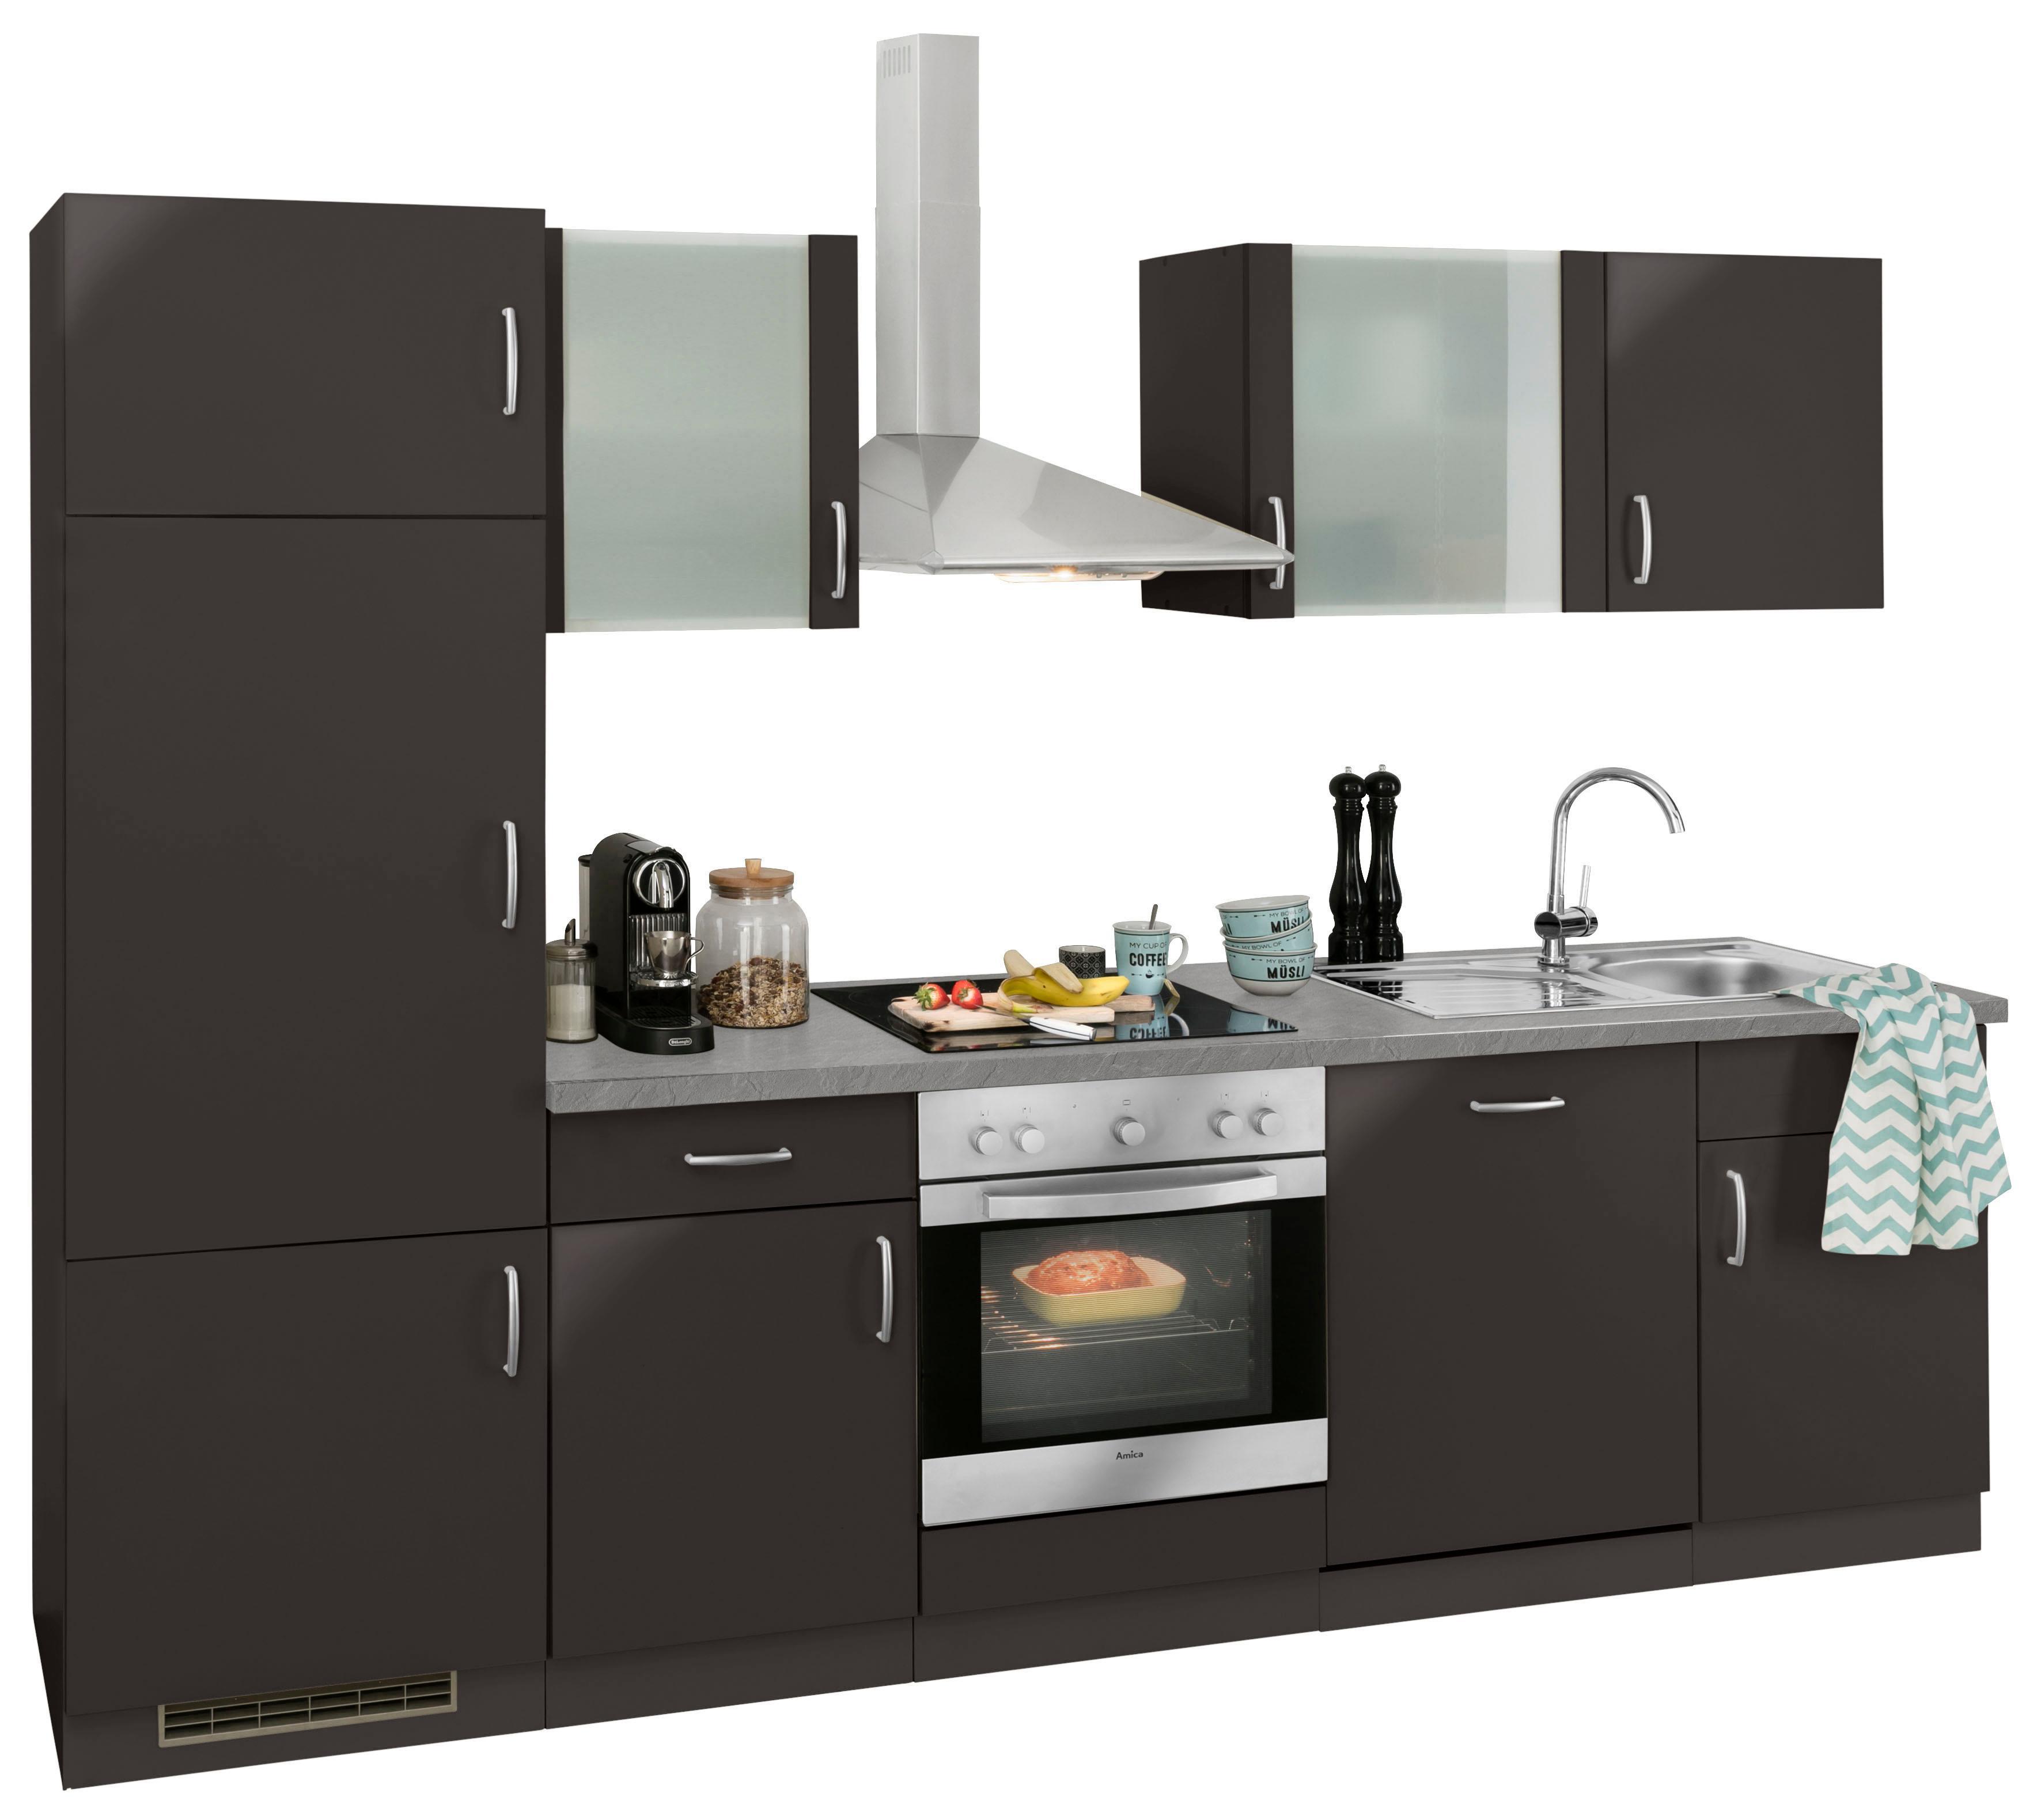 wiho k chen k chenzeile br ssel bestellen baur. Black Bedroom Furniture Sets. Home Design Ideas